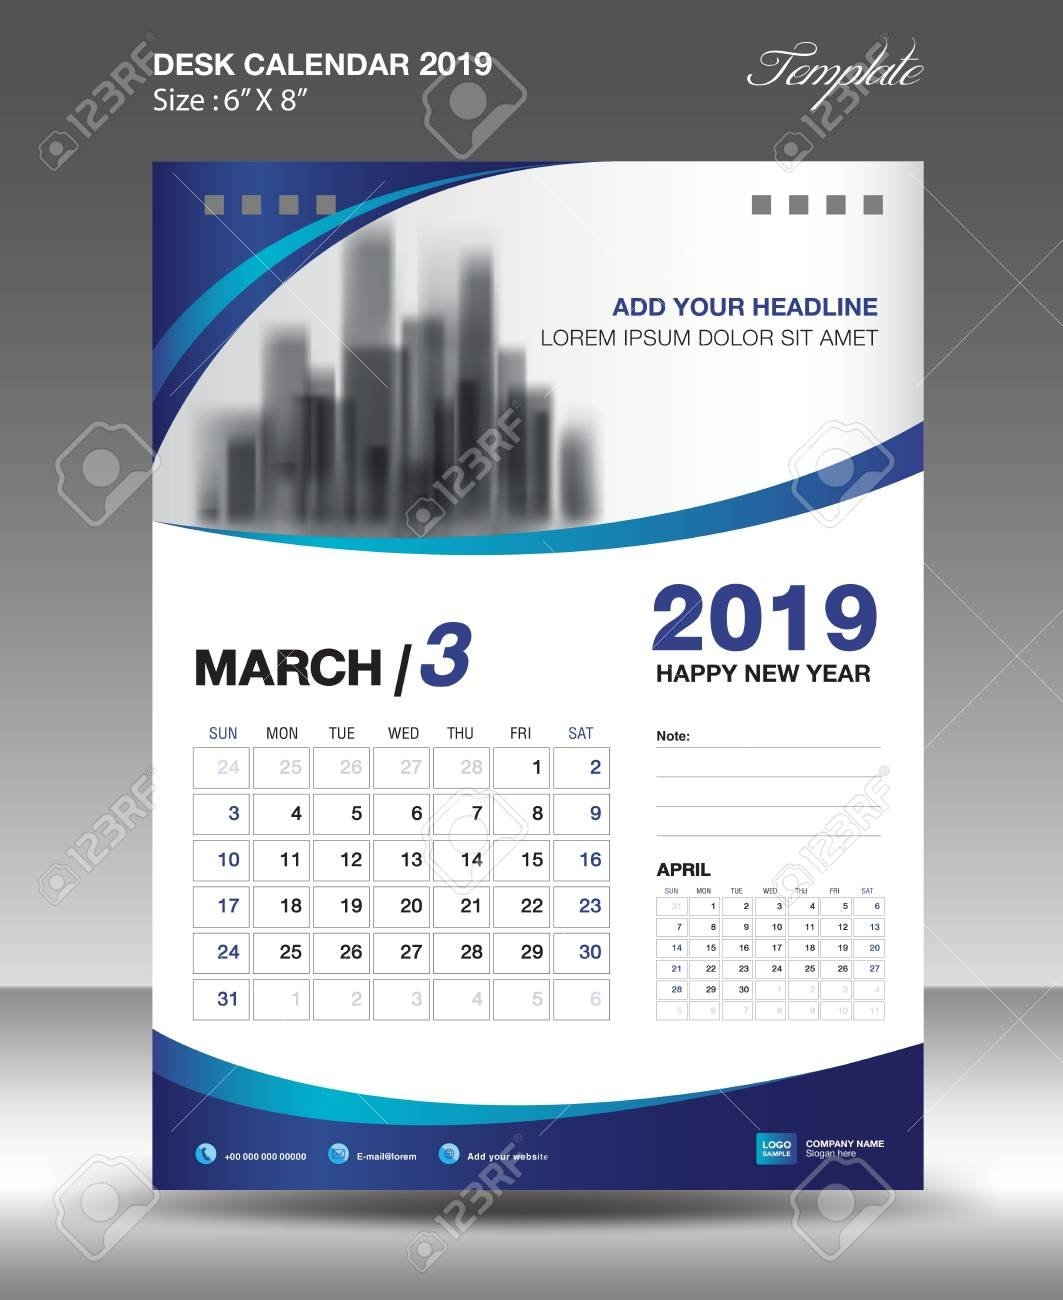 March Desk Calendar 2019 Template Flyer Design Vector Illustration Calendar 2019 Design